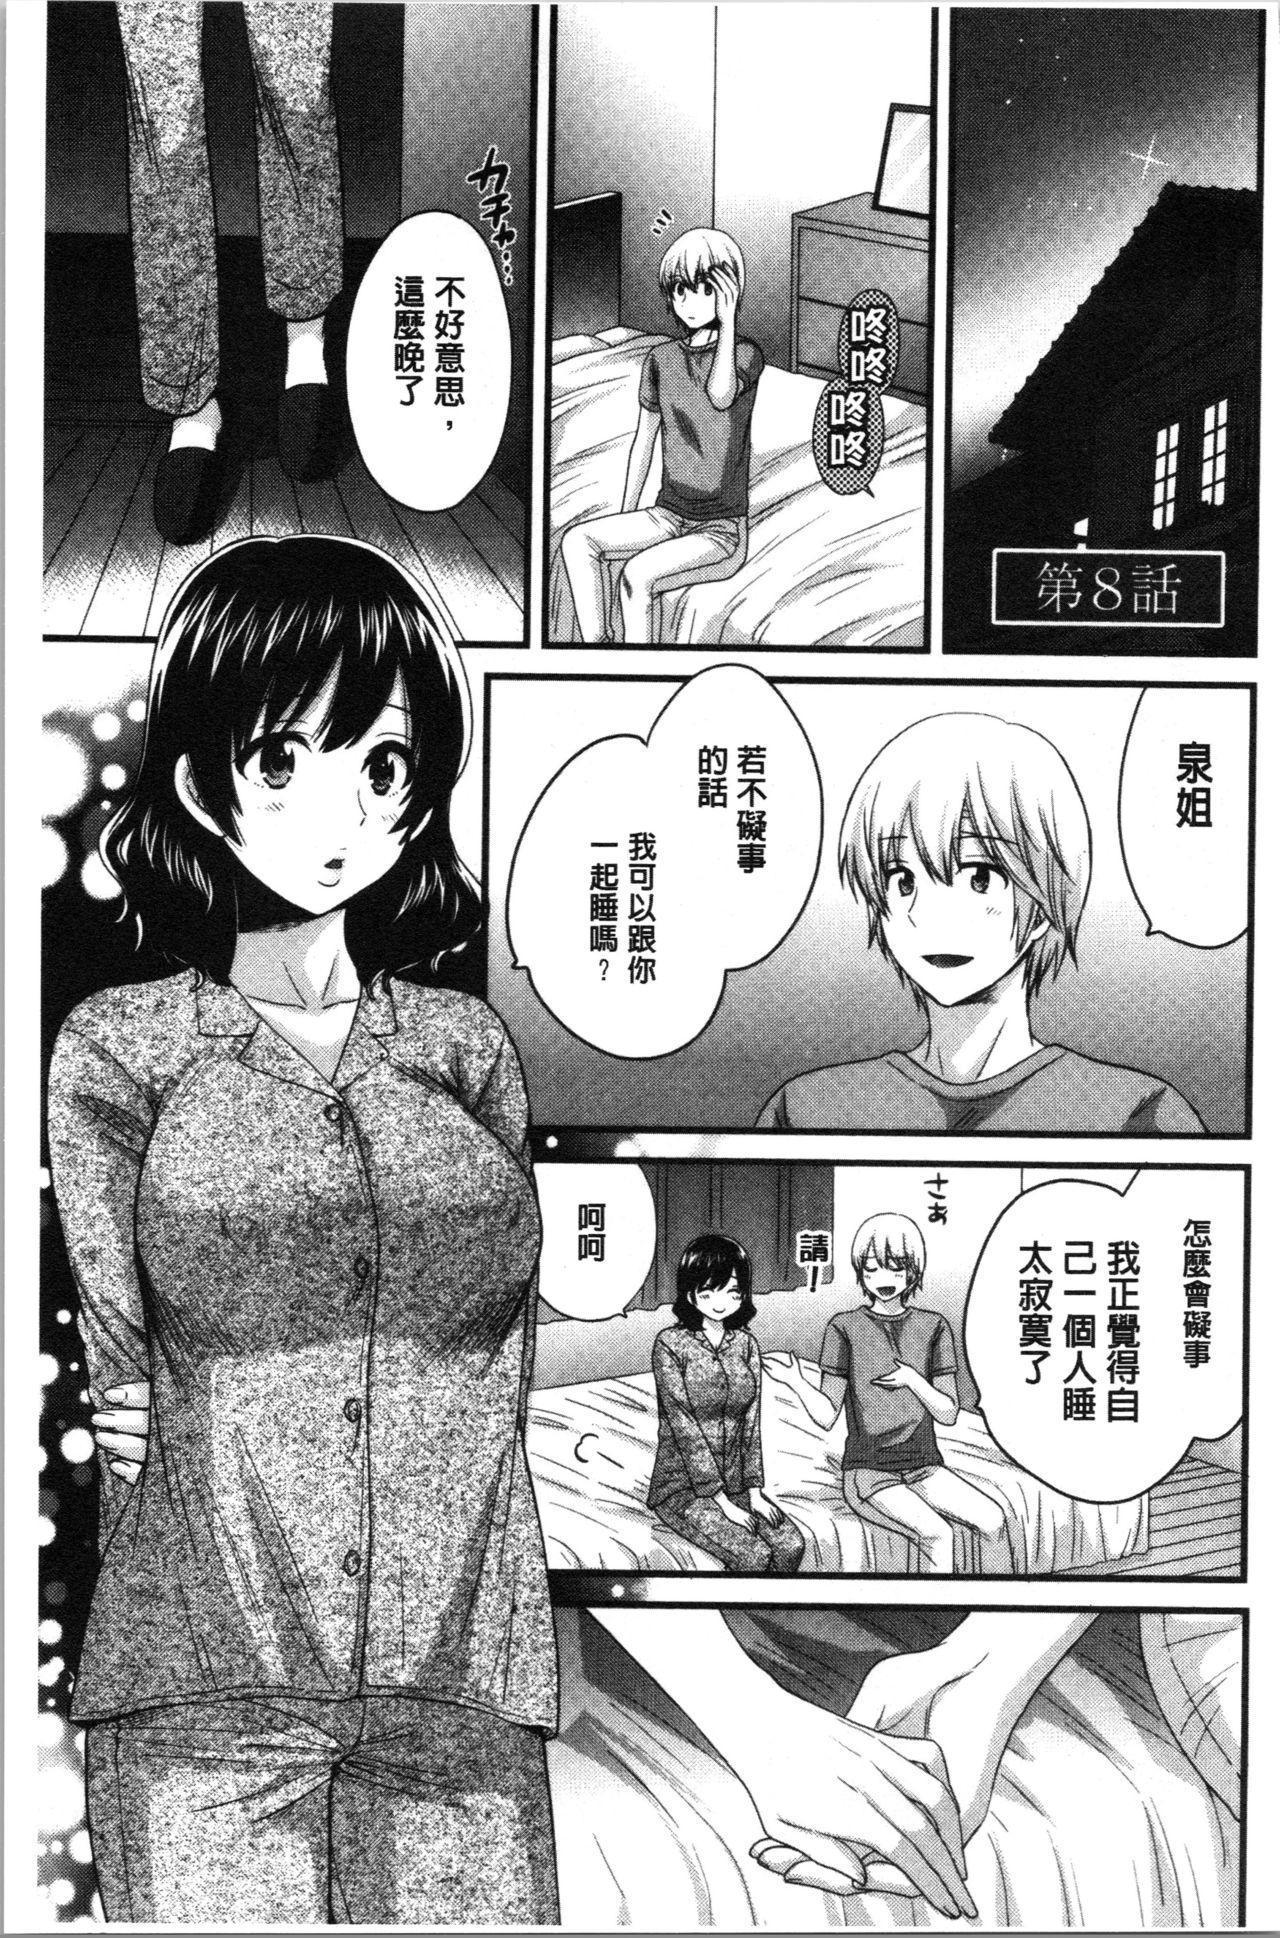 Ottori Midarana Mikami-san   嫻淑優雅又淫亂的三上小姐 136